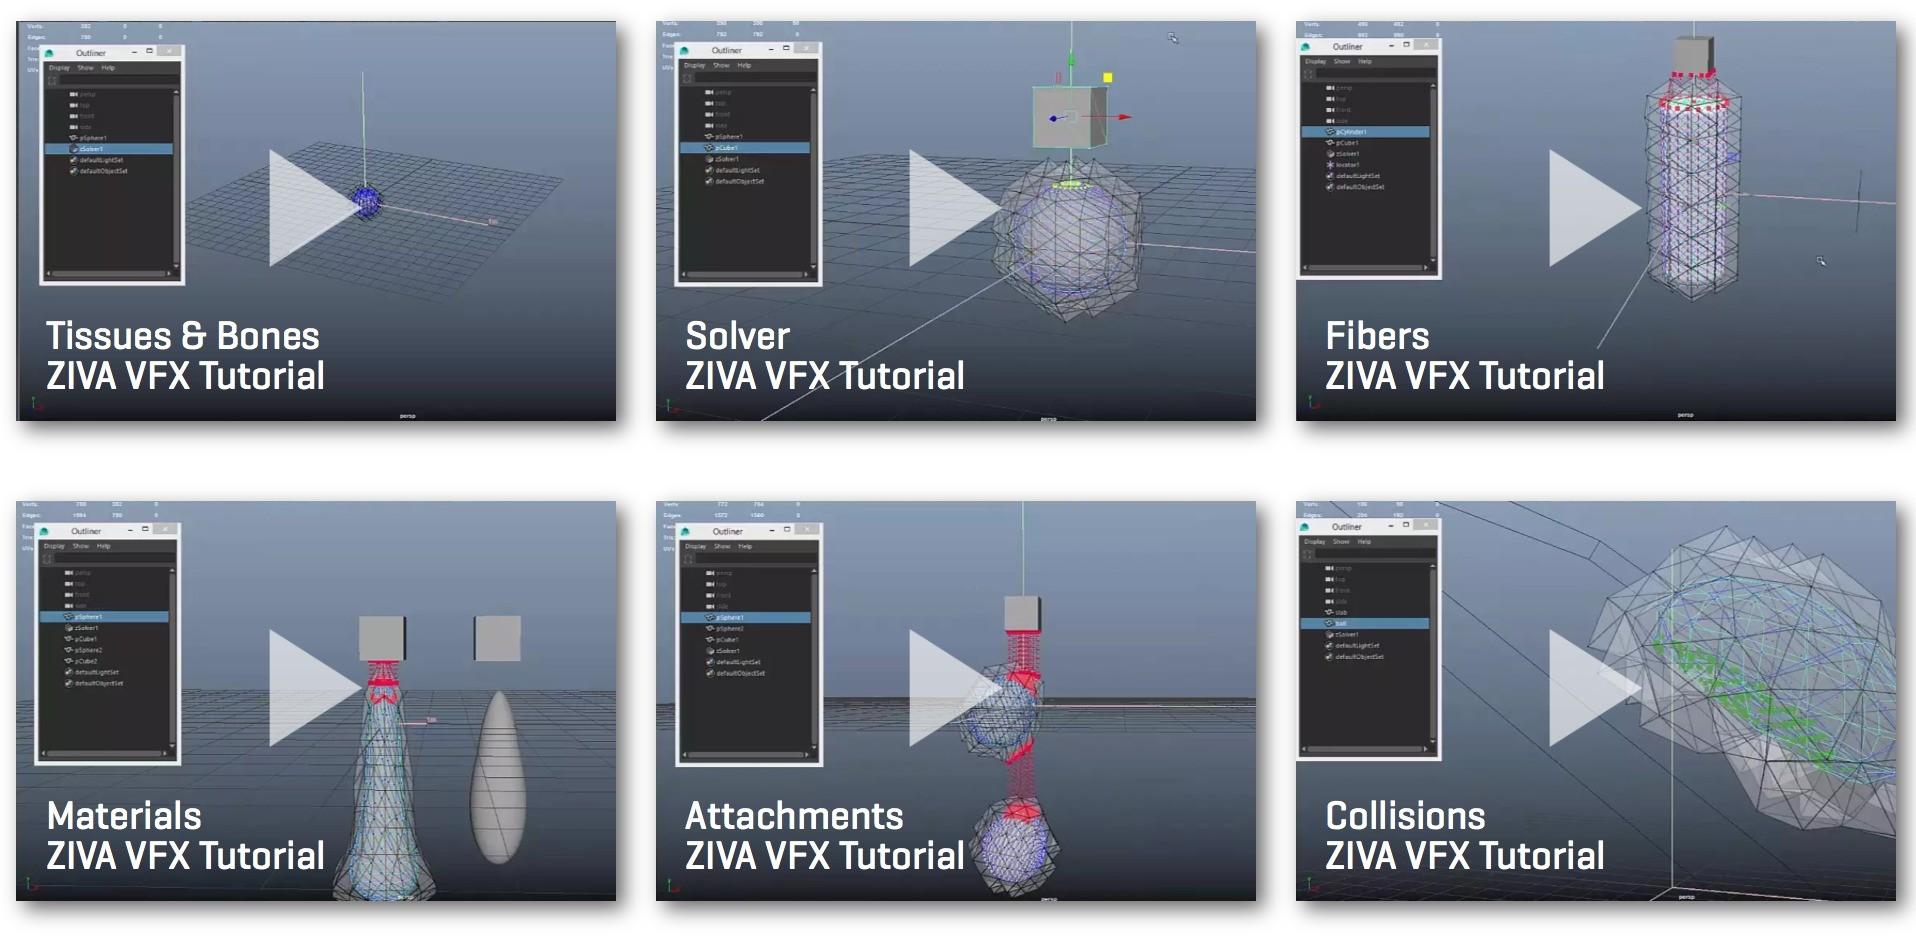 image zivavfx-tutorials.jpeg